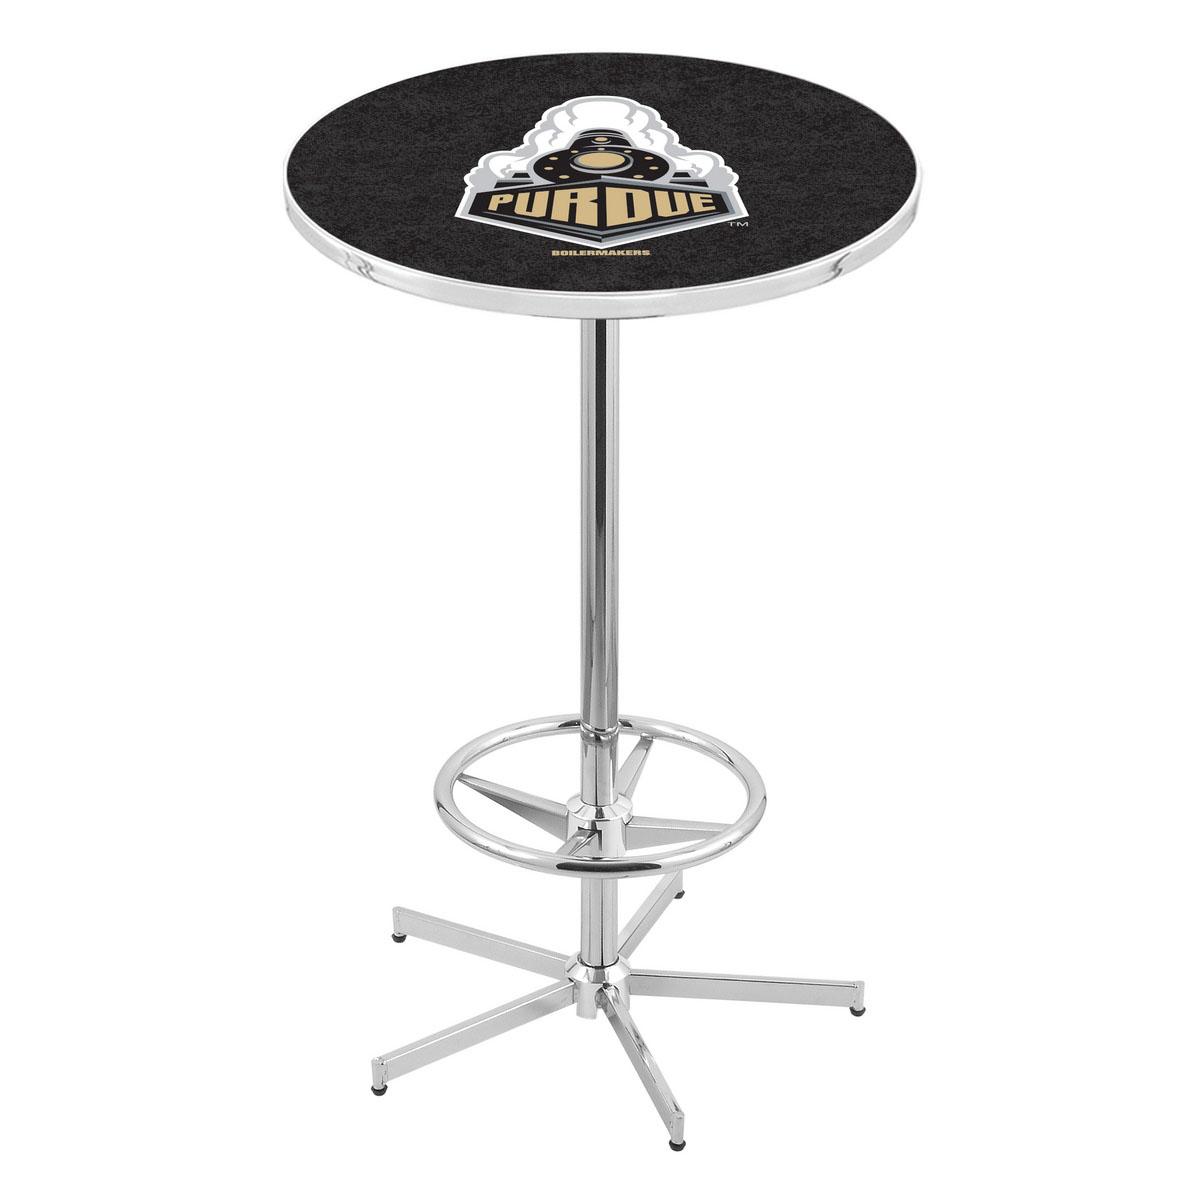 Cheap Chrome Purdue Pub Table Product Photo